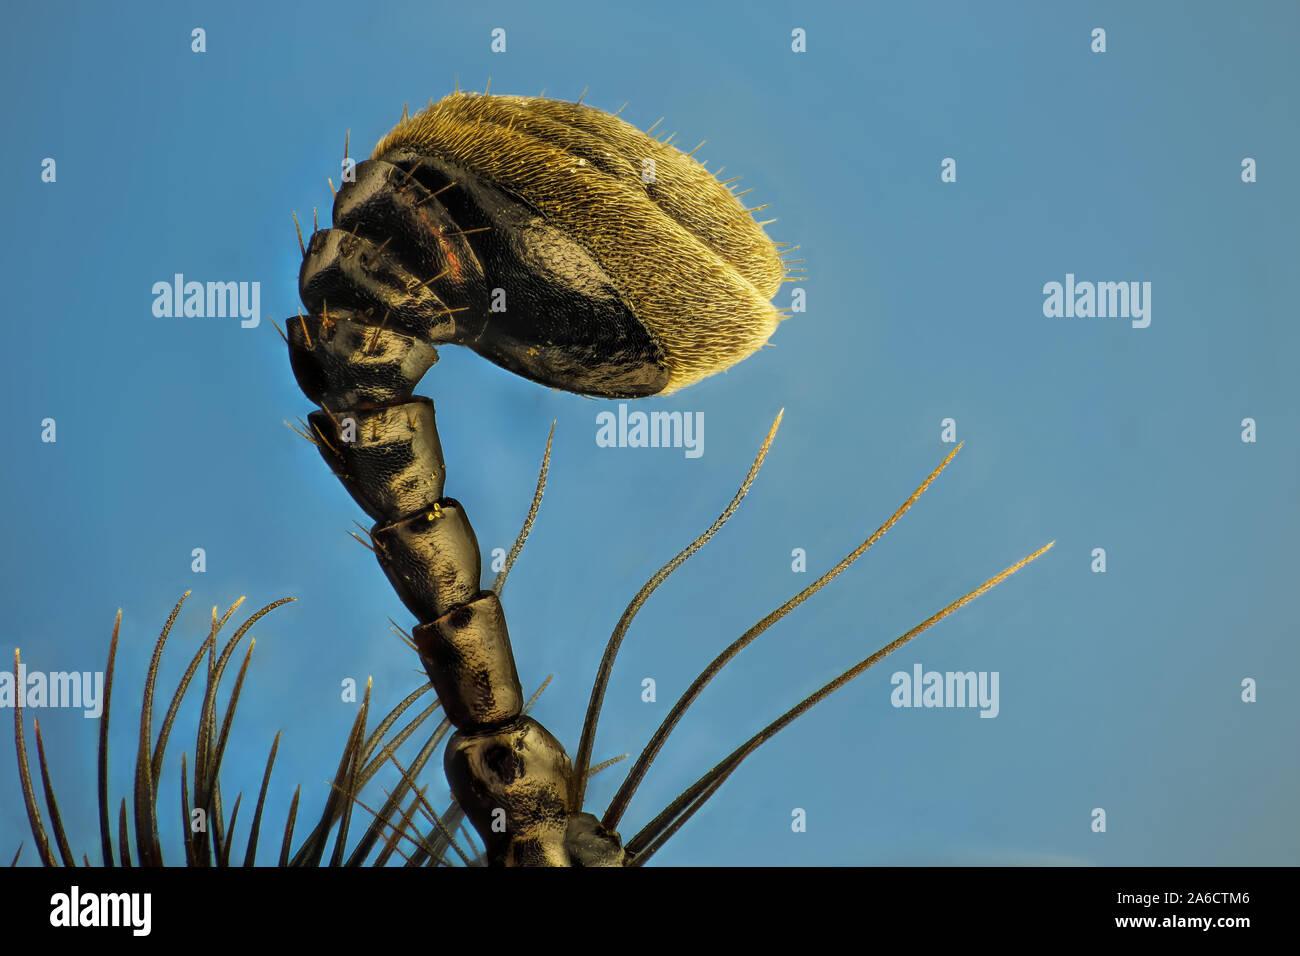 Anoplotrupes stercorosus, the dor beetle, is a species of earth-boring dung beetle. Skogstordyvel Stock Photo